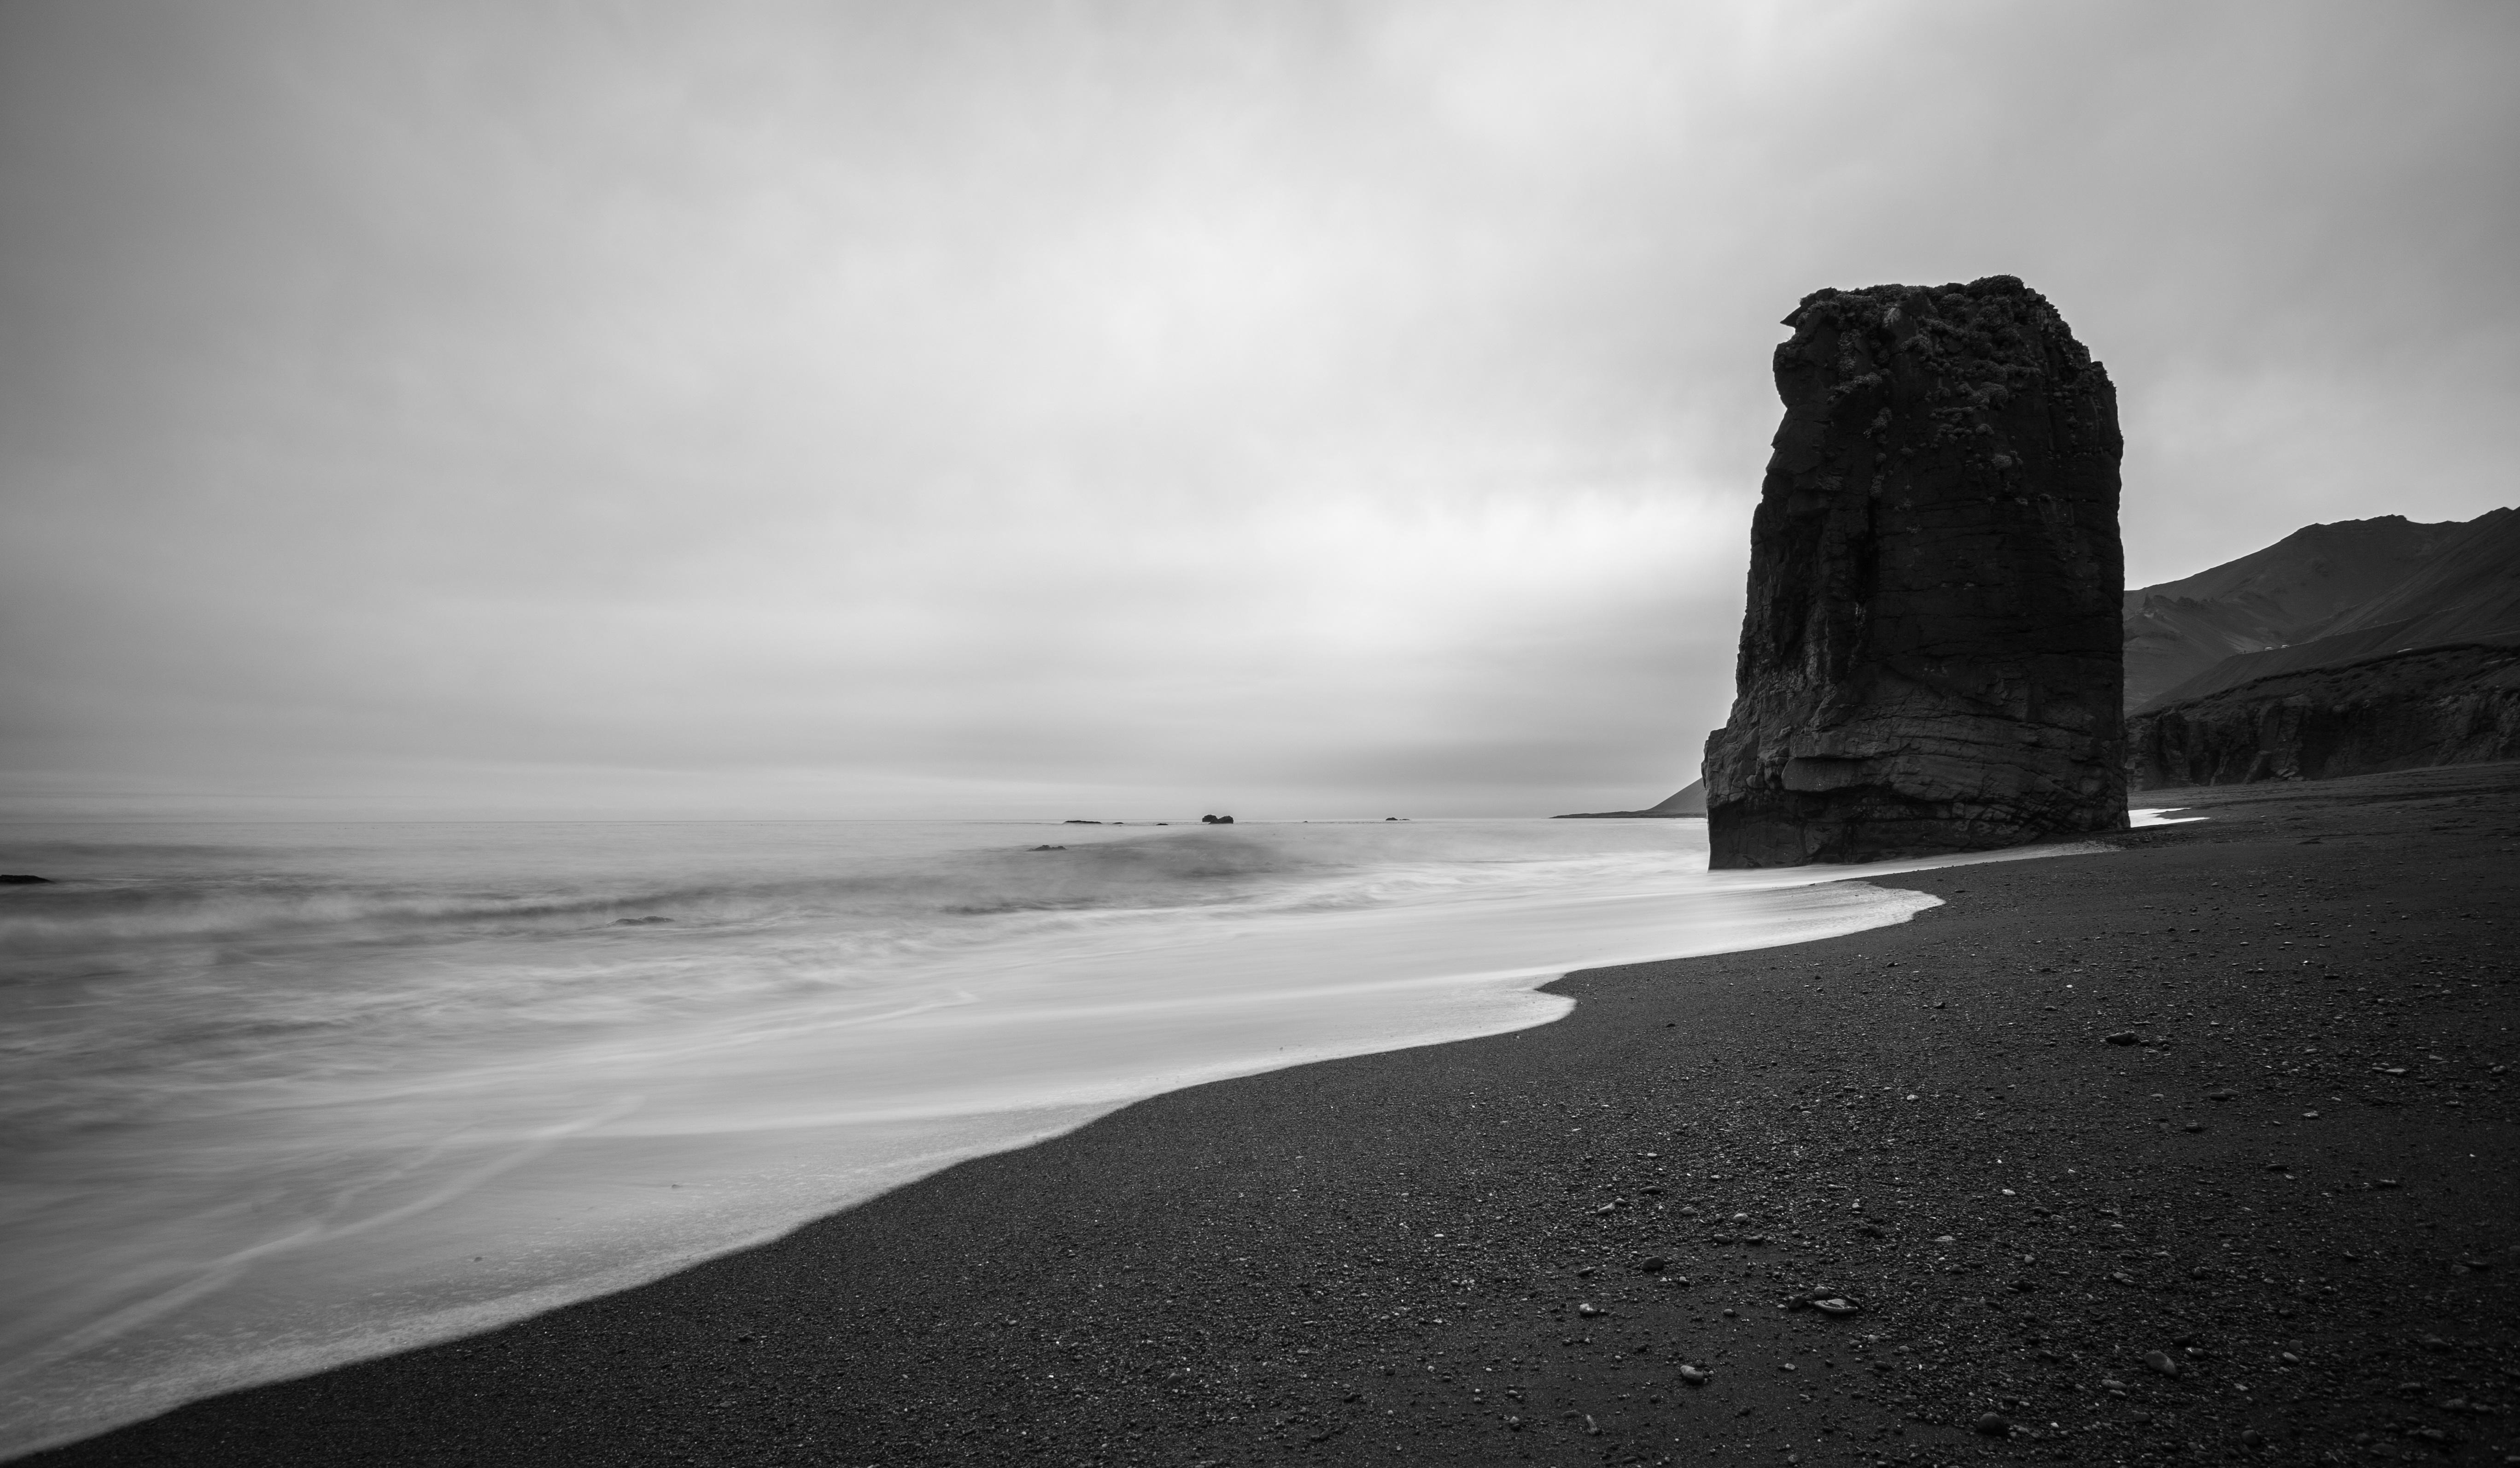 Free Images : beach, coast, sand, rock, ocean, horizon